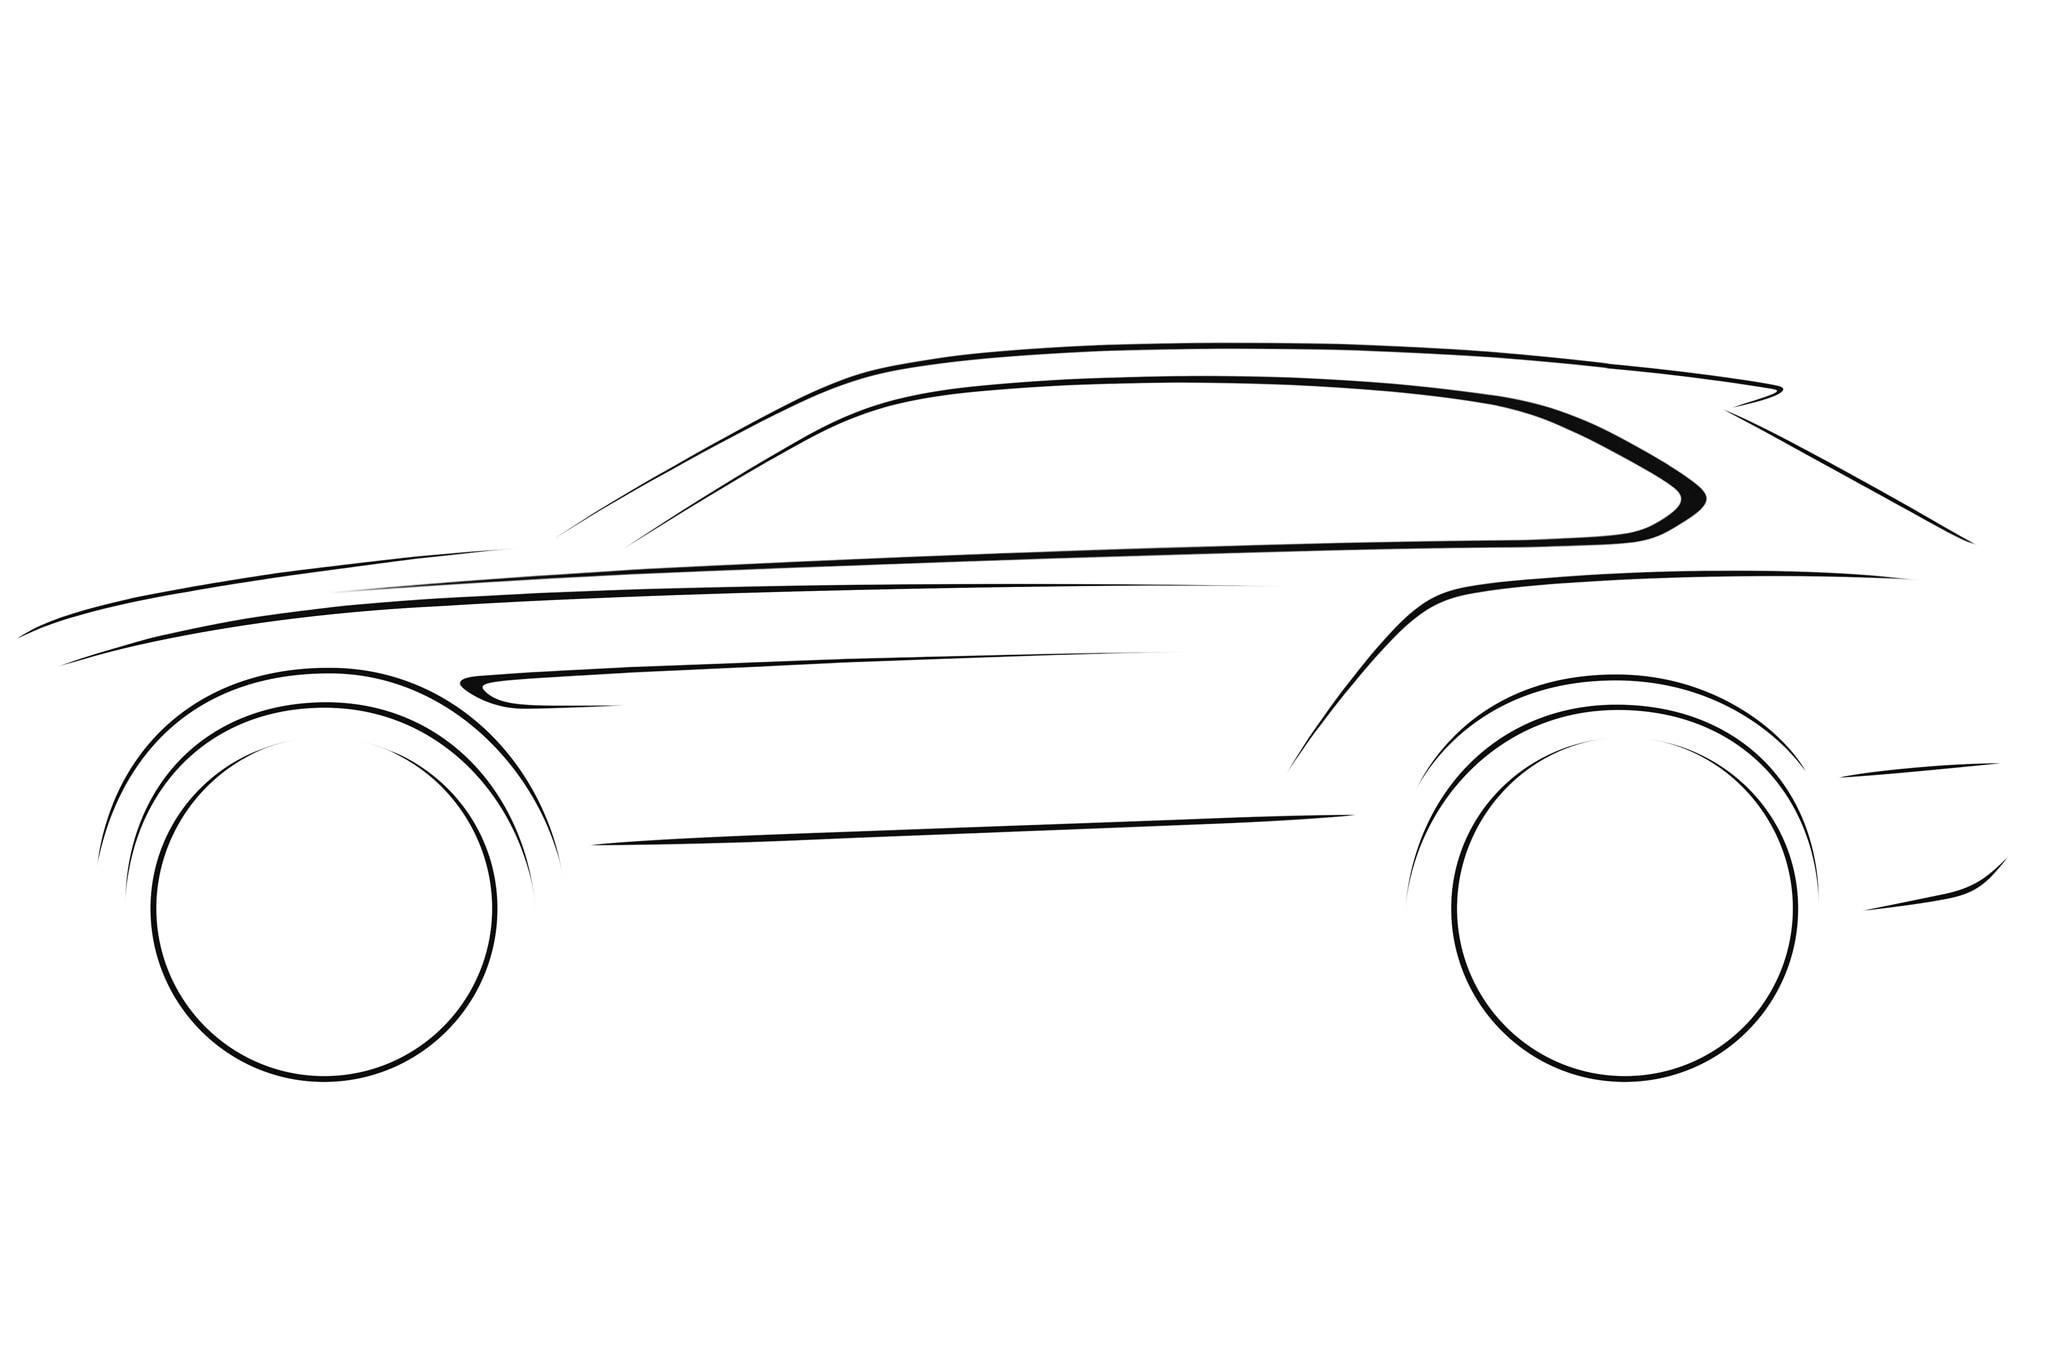 2016 Bentley SUV Teaser Image1